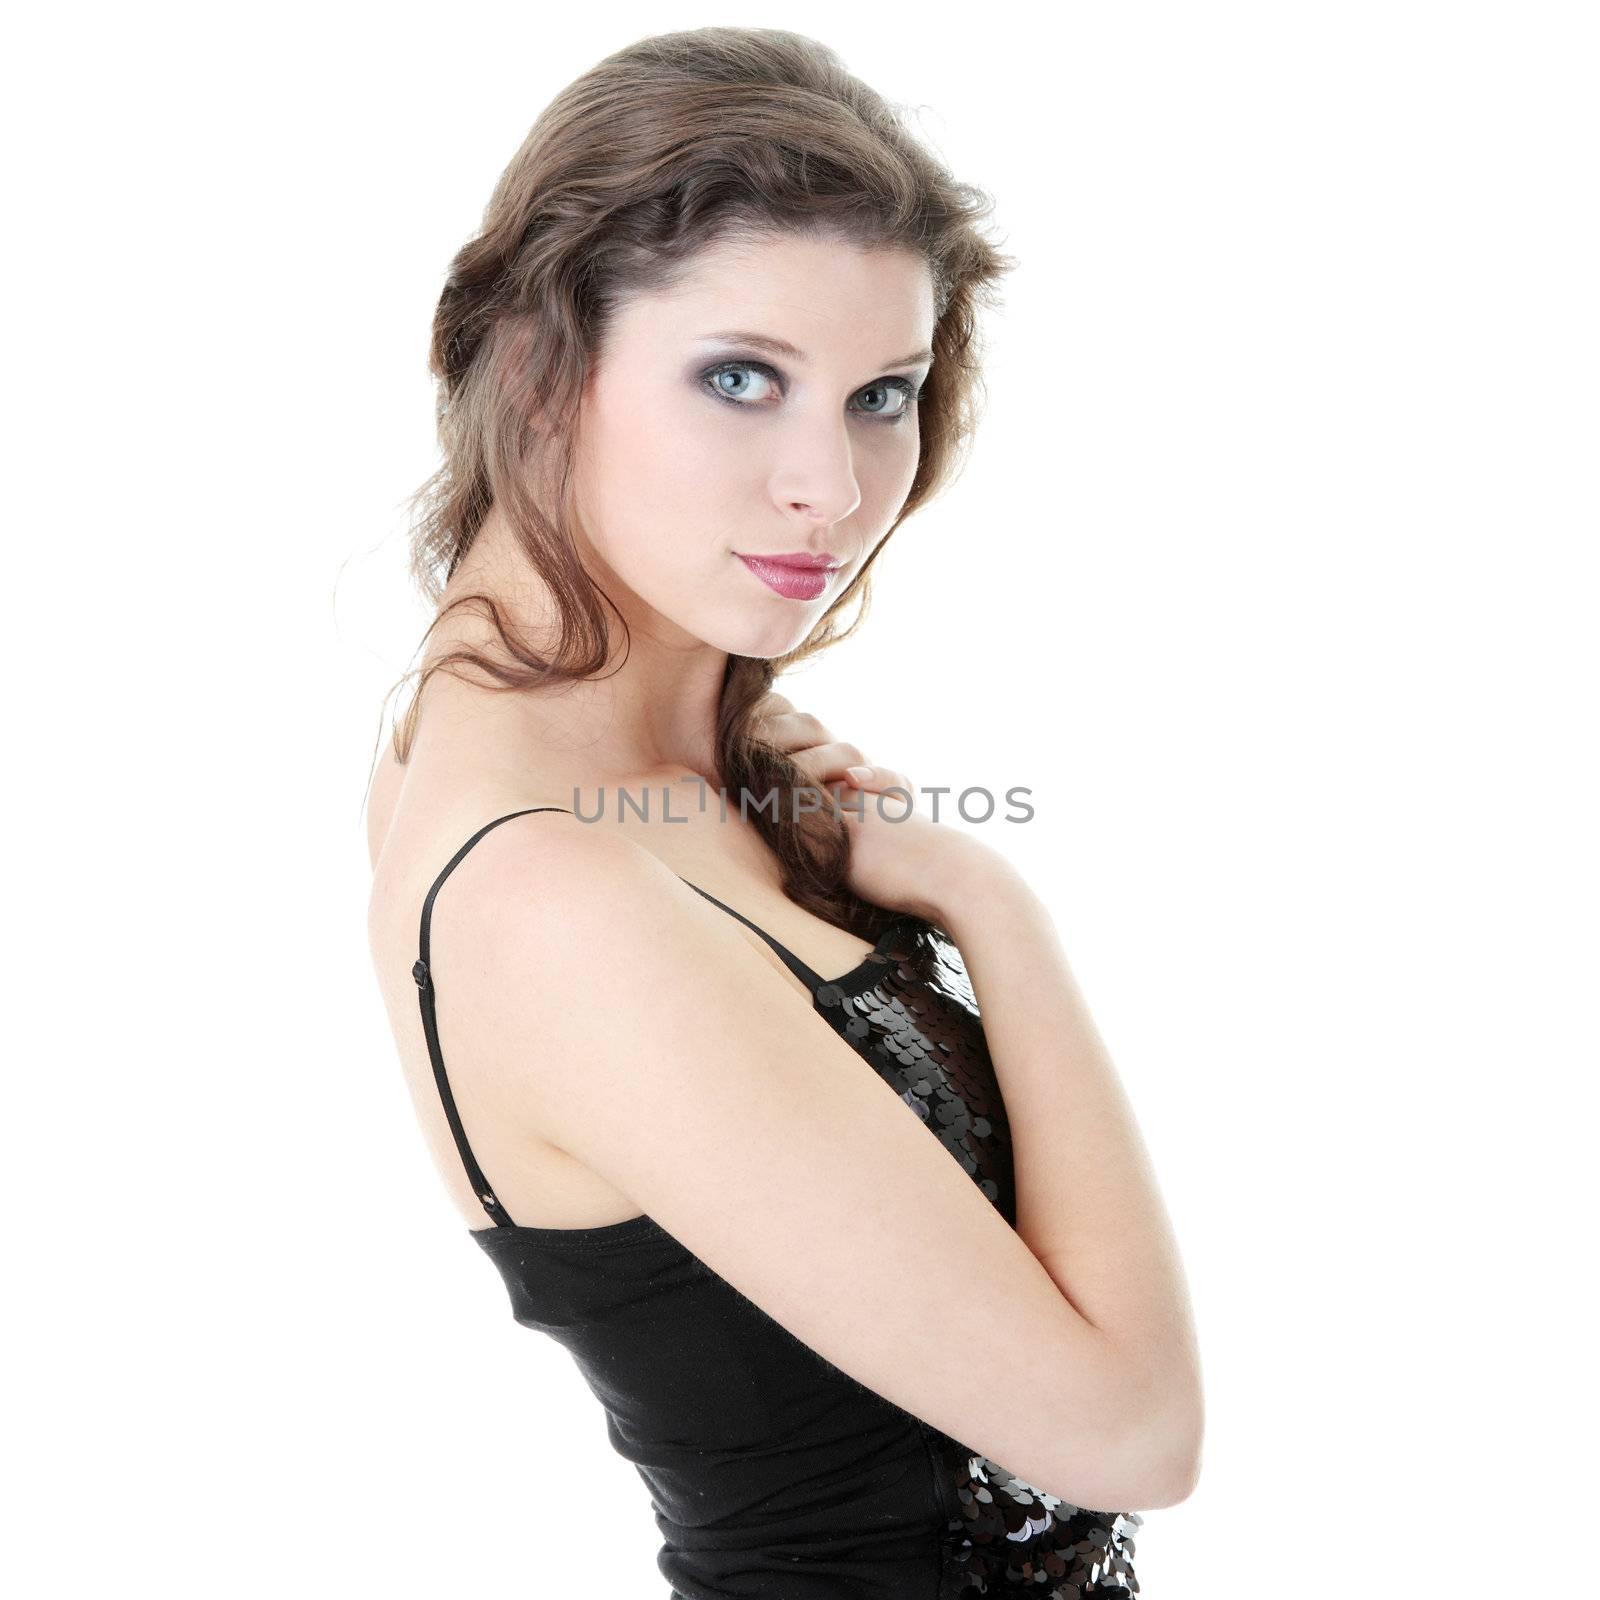 Catwalk fashion model isolated on a white background